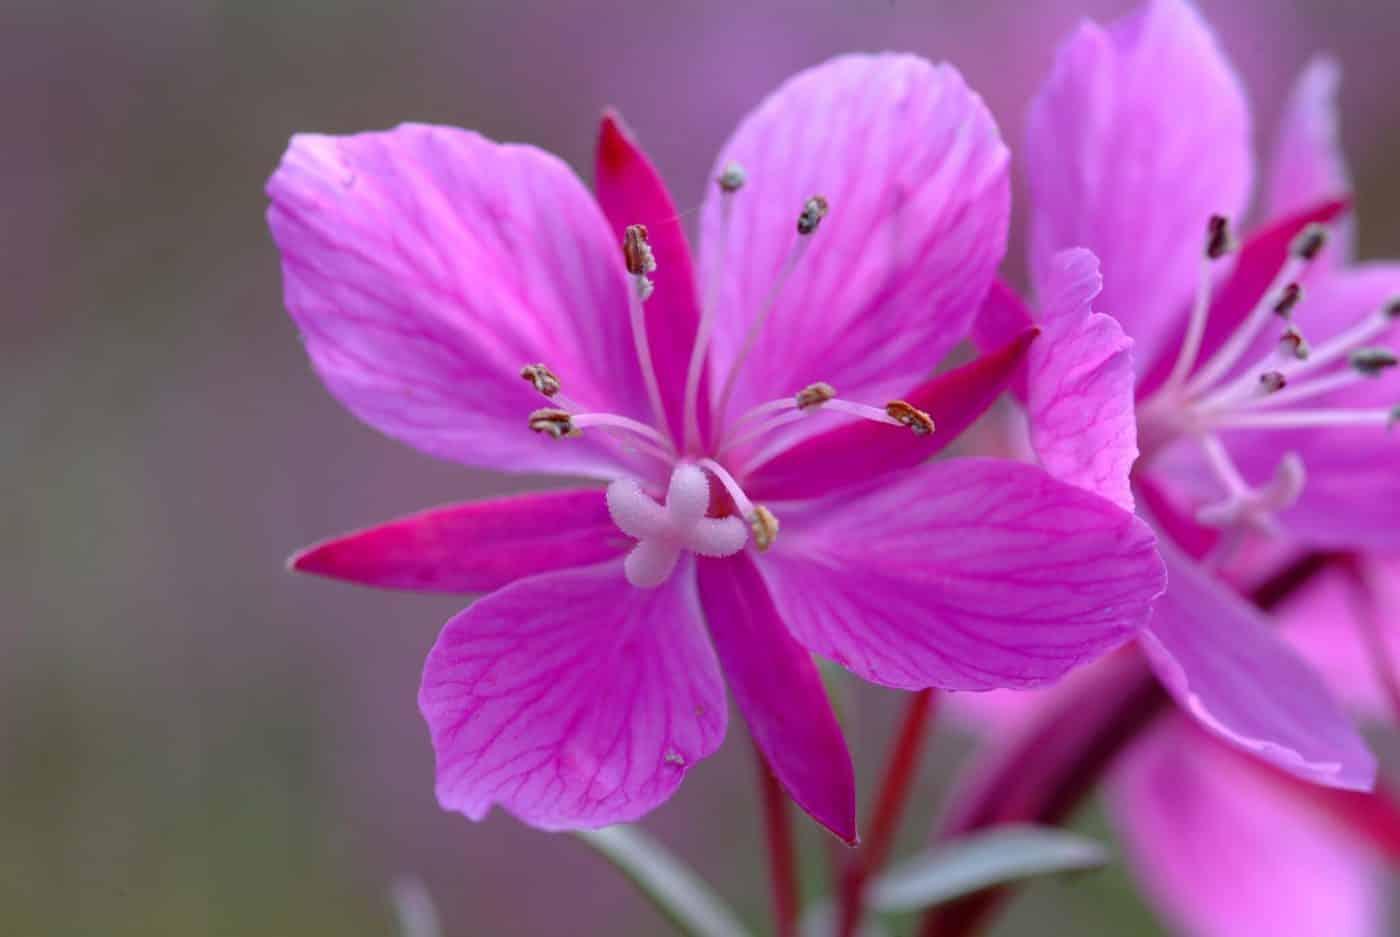 Flower Blomst. By Visit Greenland